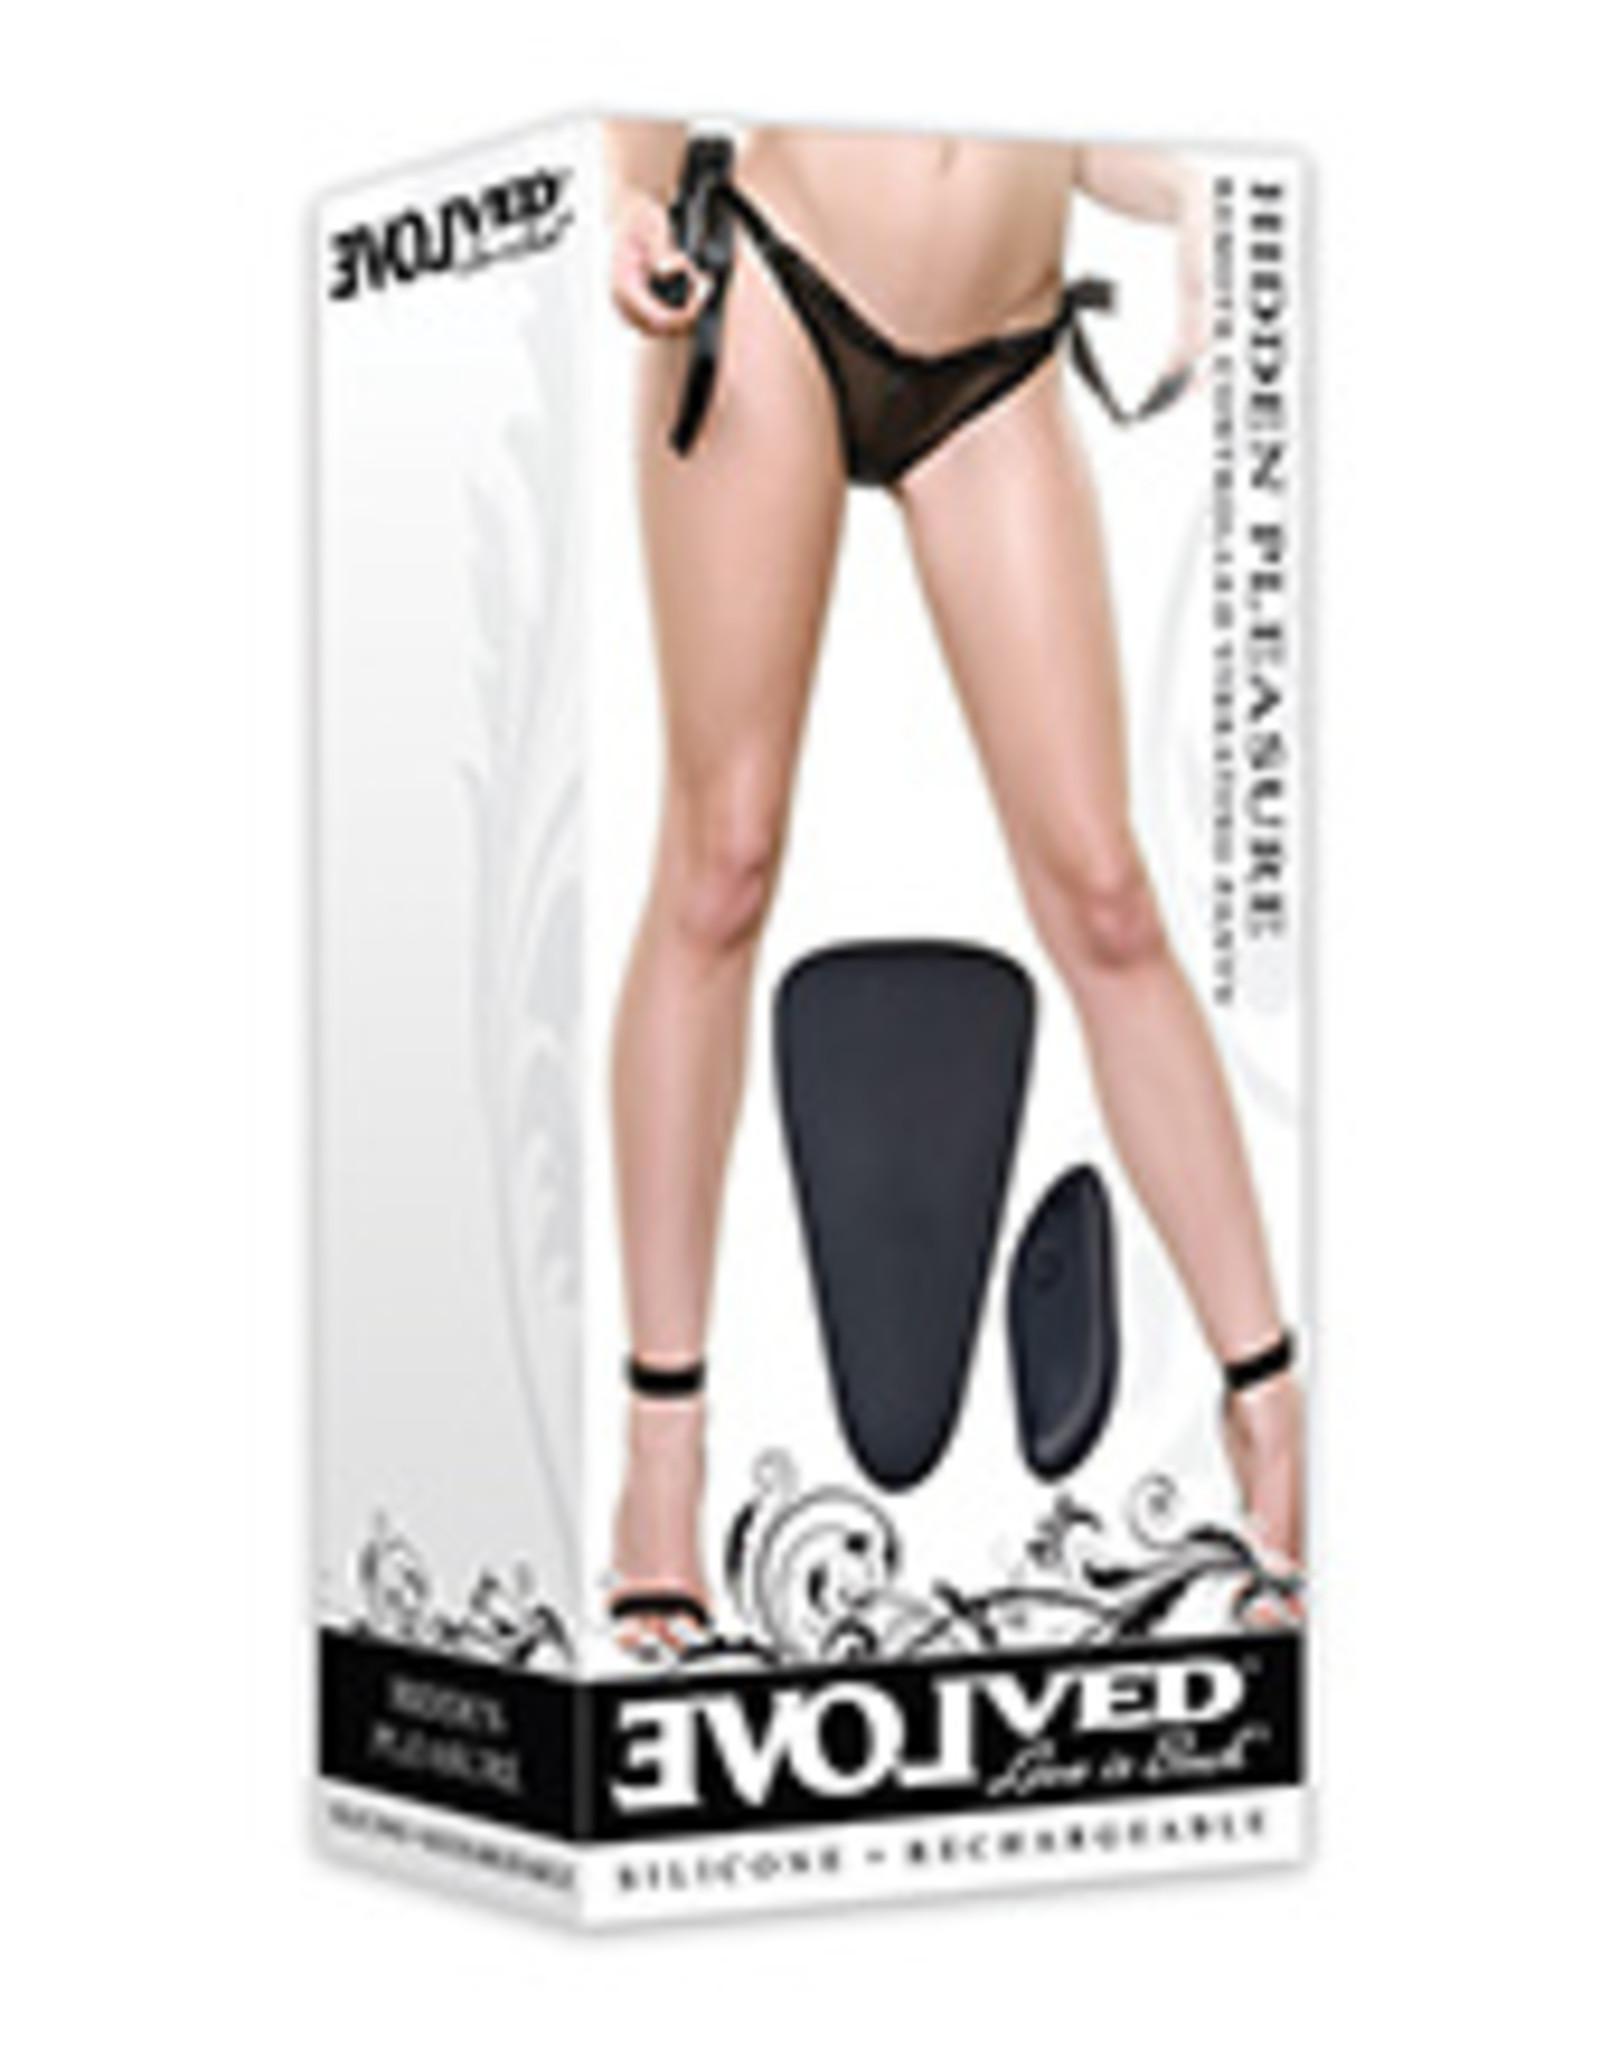 Evolved Hidden Pleasure Panty Vibe - Black